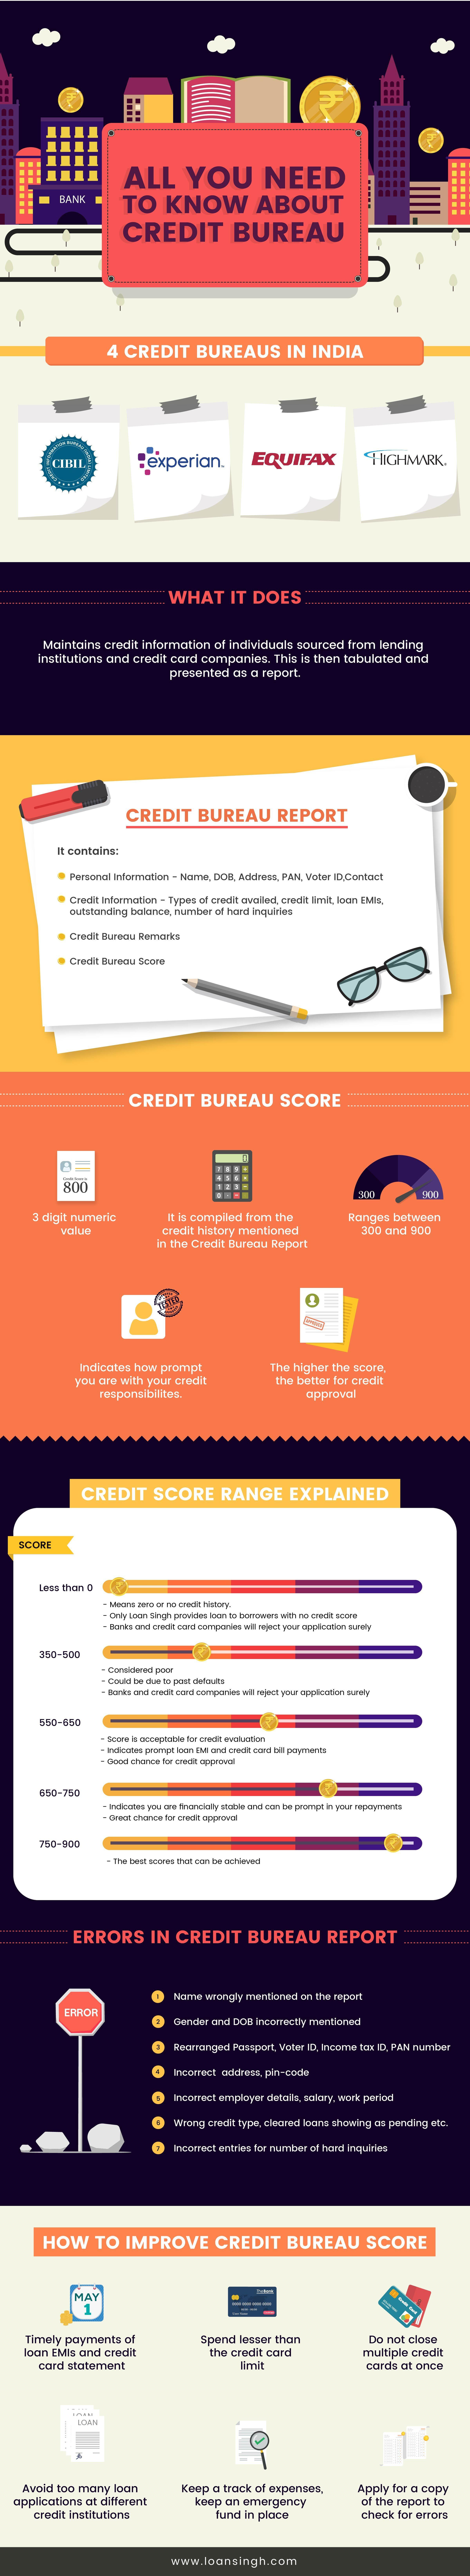 Loan Singh Is A Digital Lending Platform That Provides Small Loans Cheap Loans Quick Loan Best Personal Loa Personal Loans Loans For Bad Credit Medical Loans